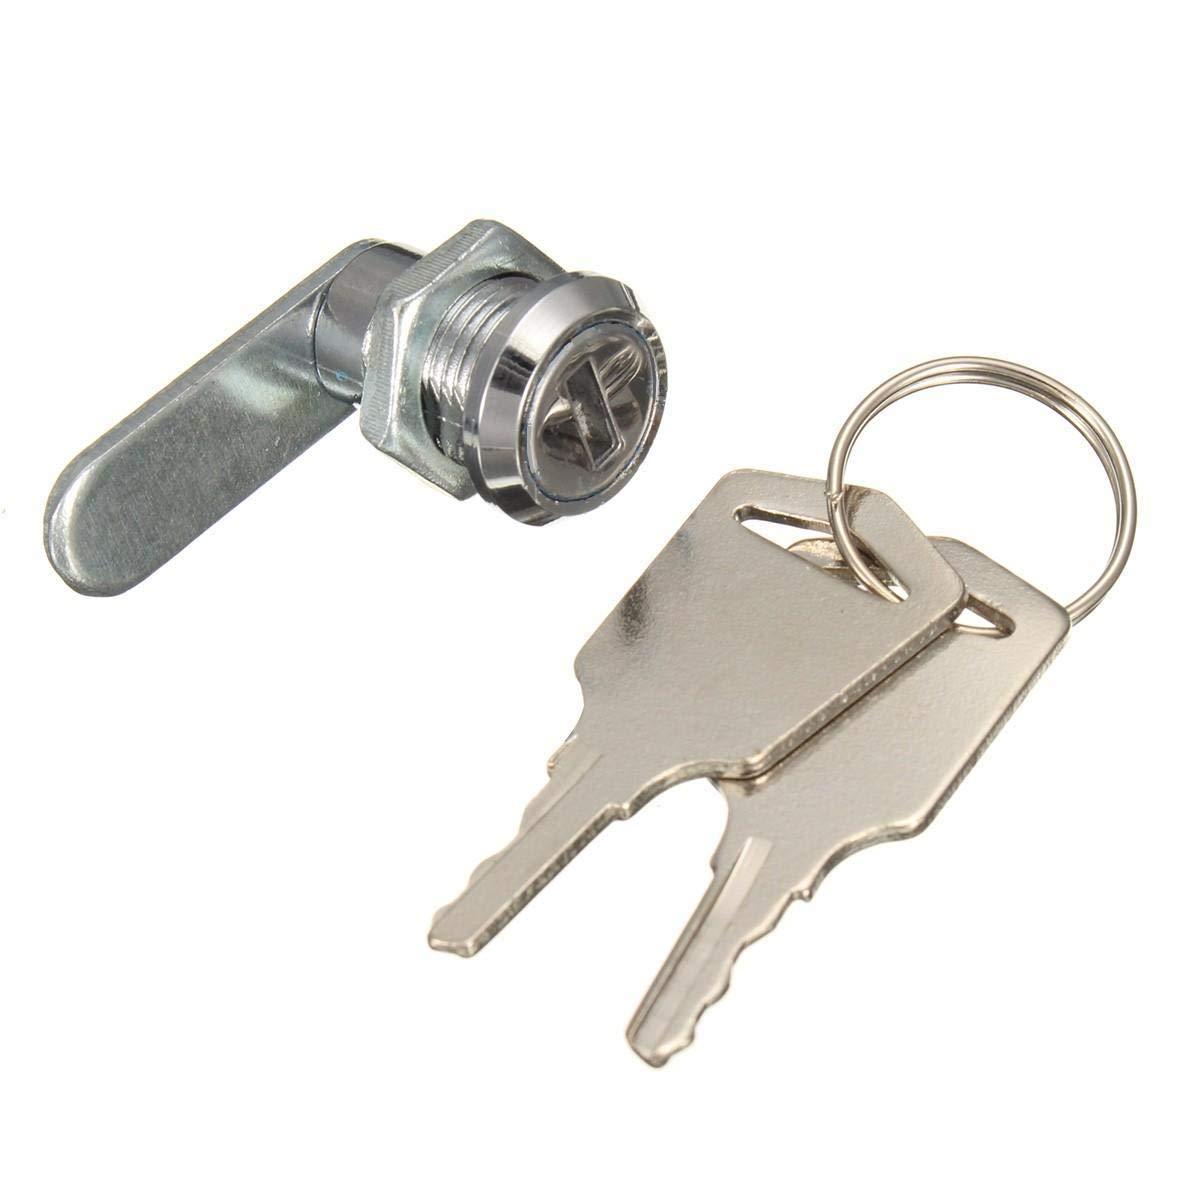 16mm Keyed Cam Lock For Filing Cabinet Mailbox Drawer Cupboard with 2 Keys - Hardware & Accessories Door Hardware & Locks - 1 x Cam lock